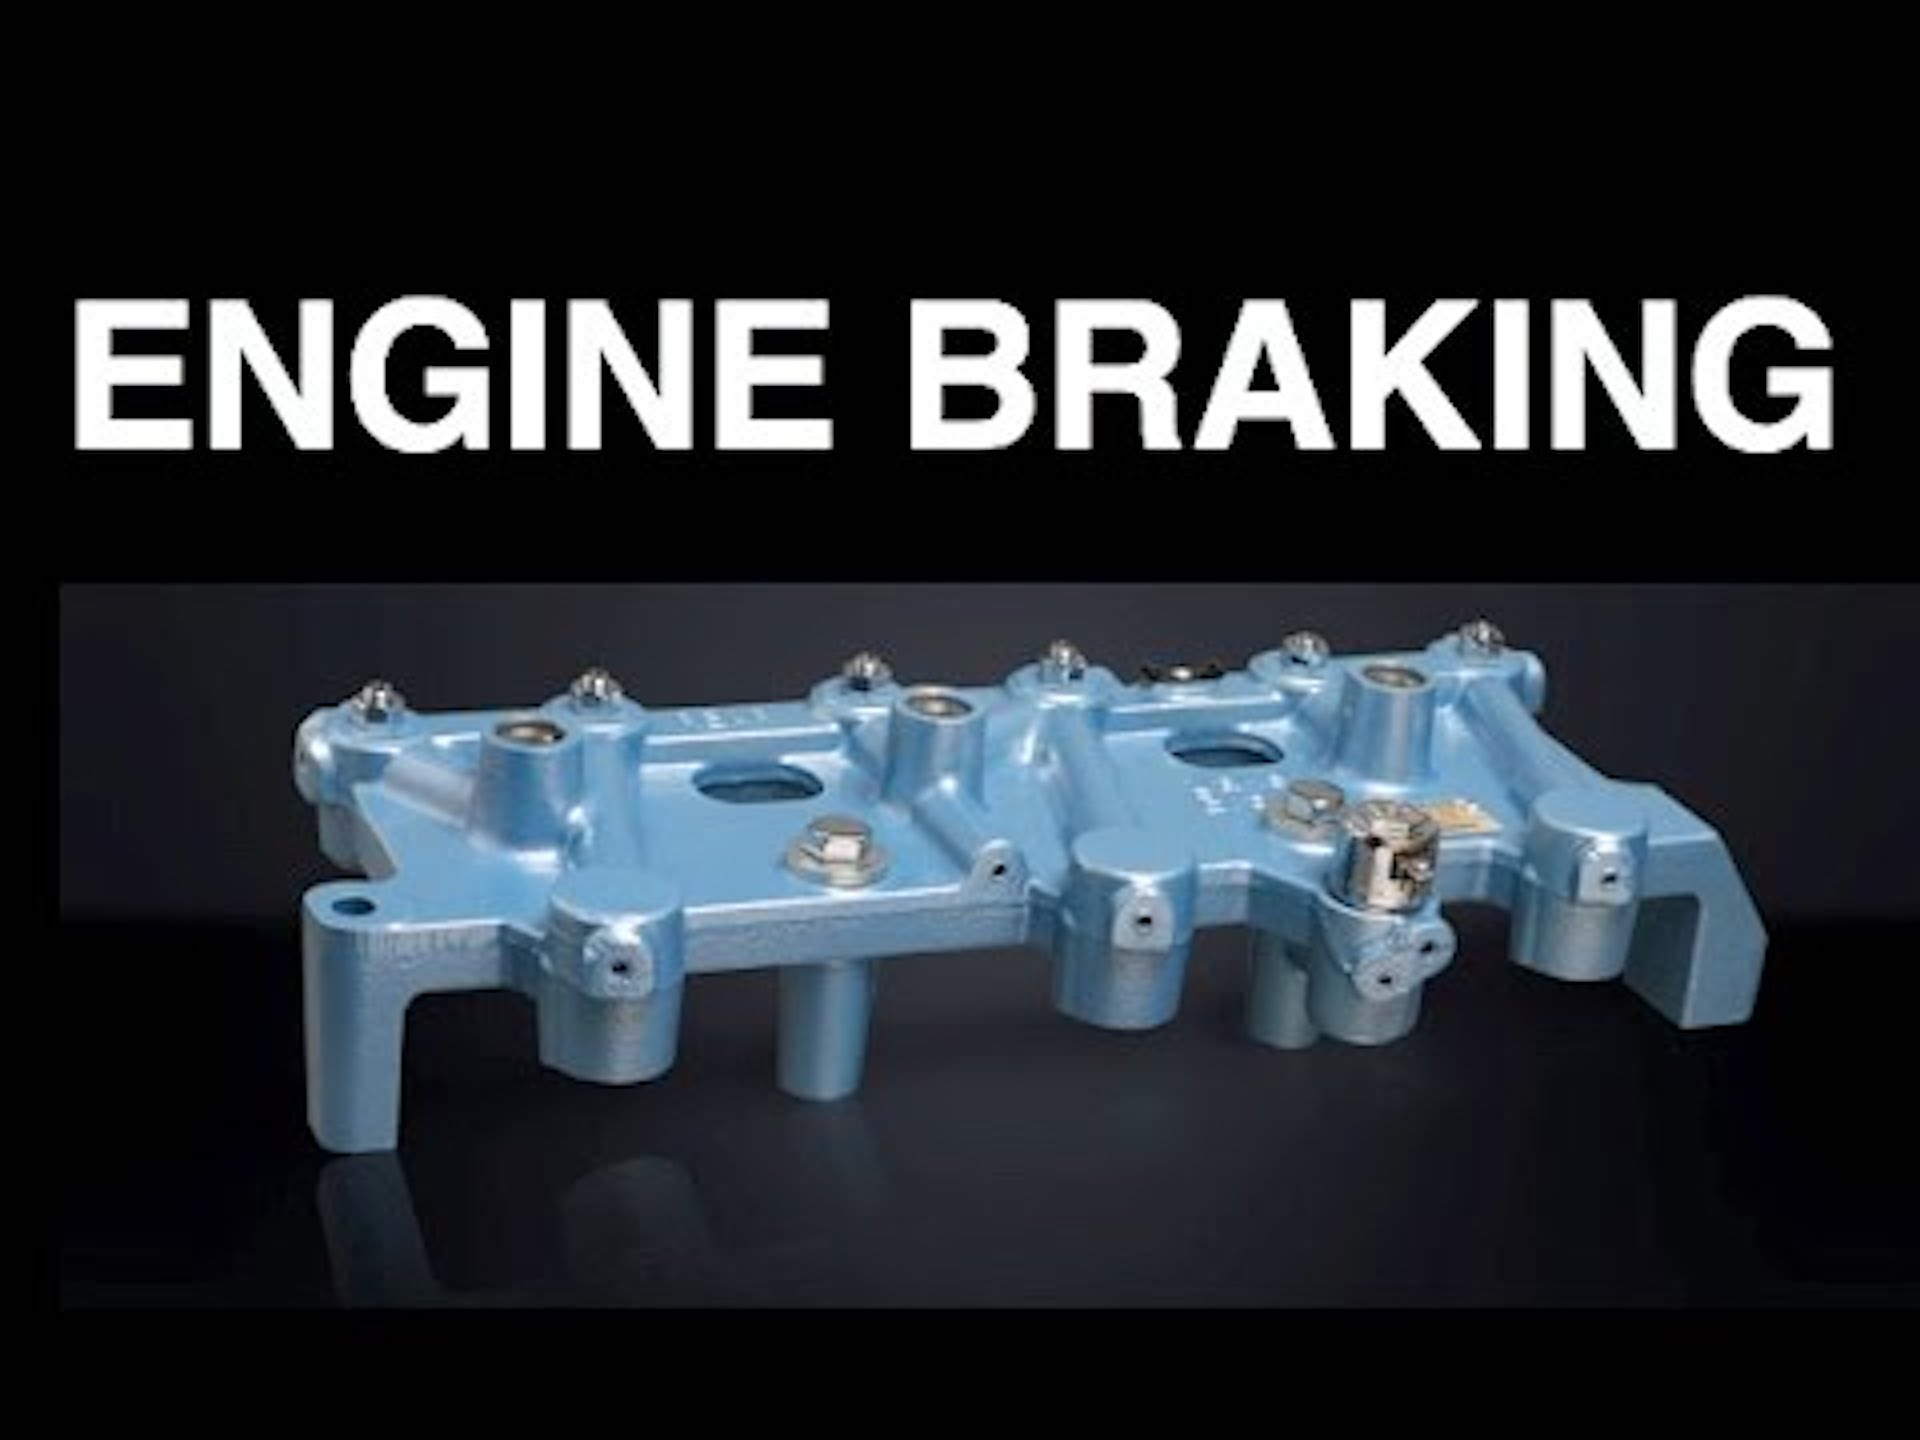 Engine braking - what is it 58